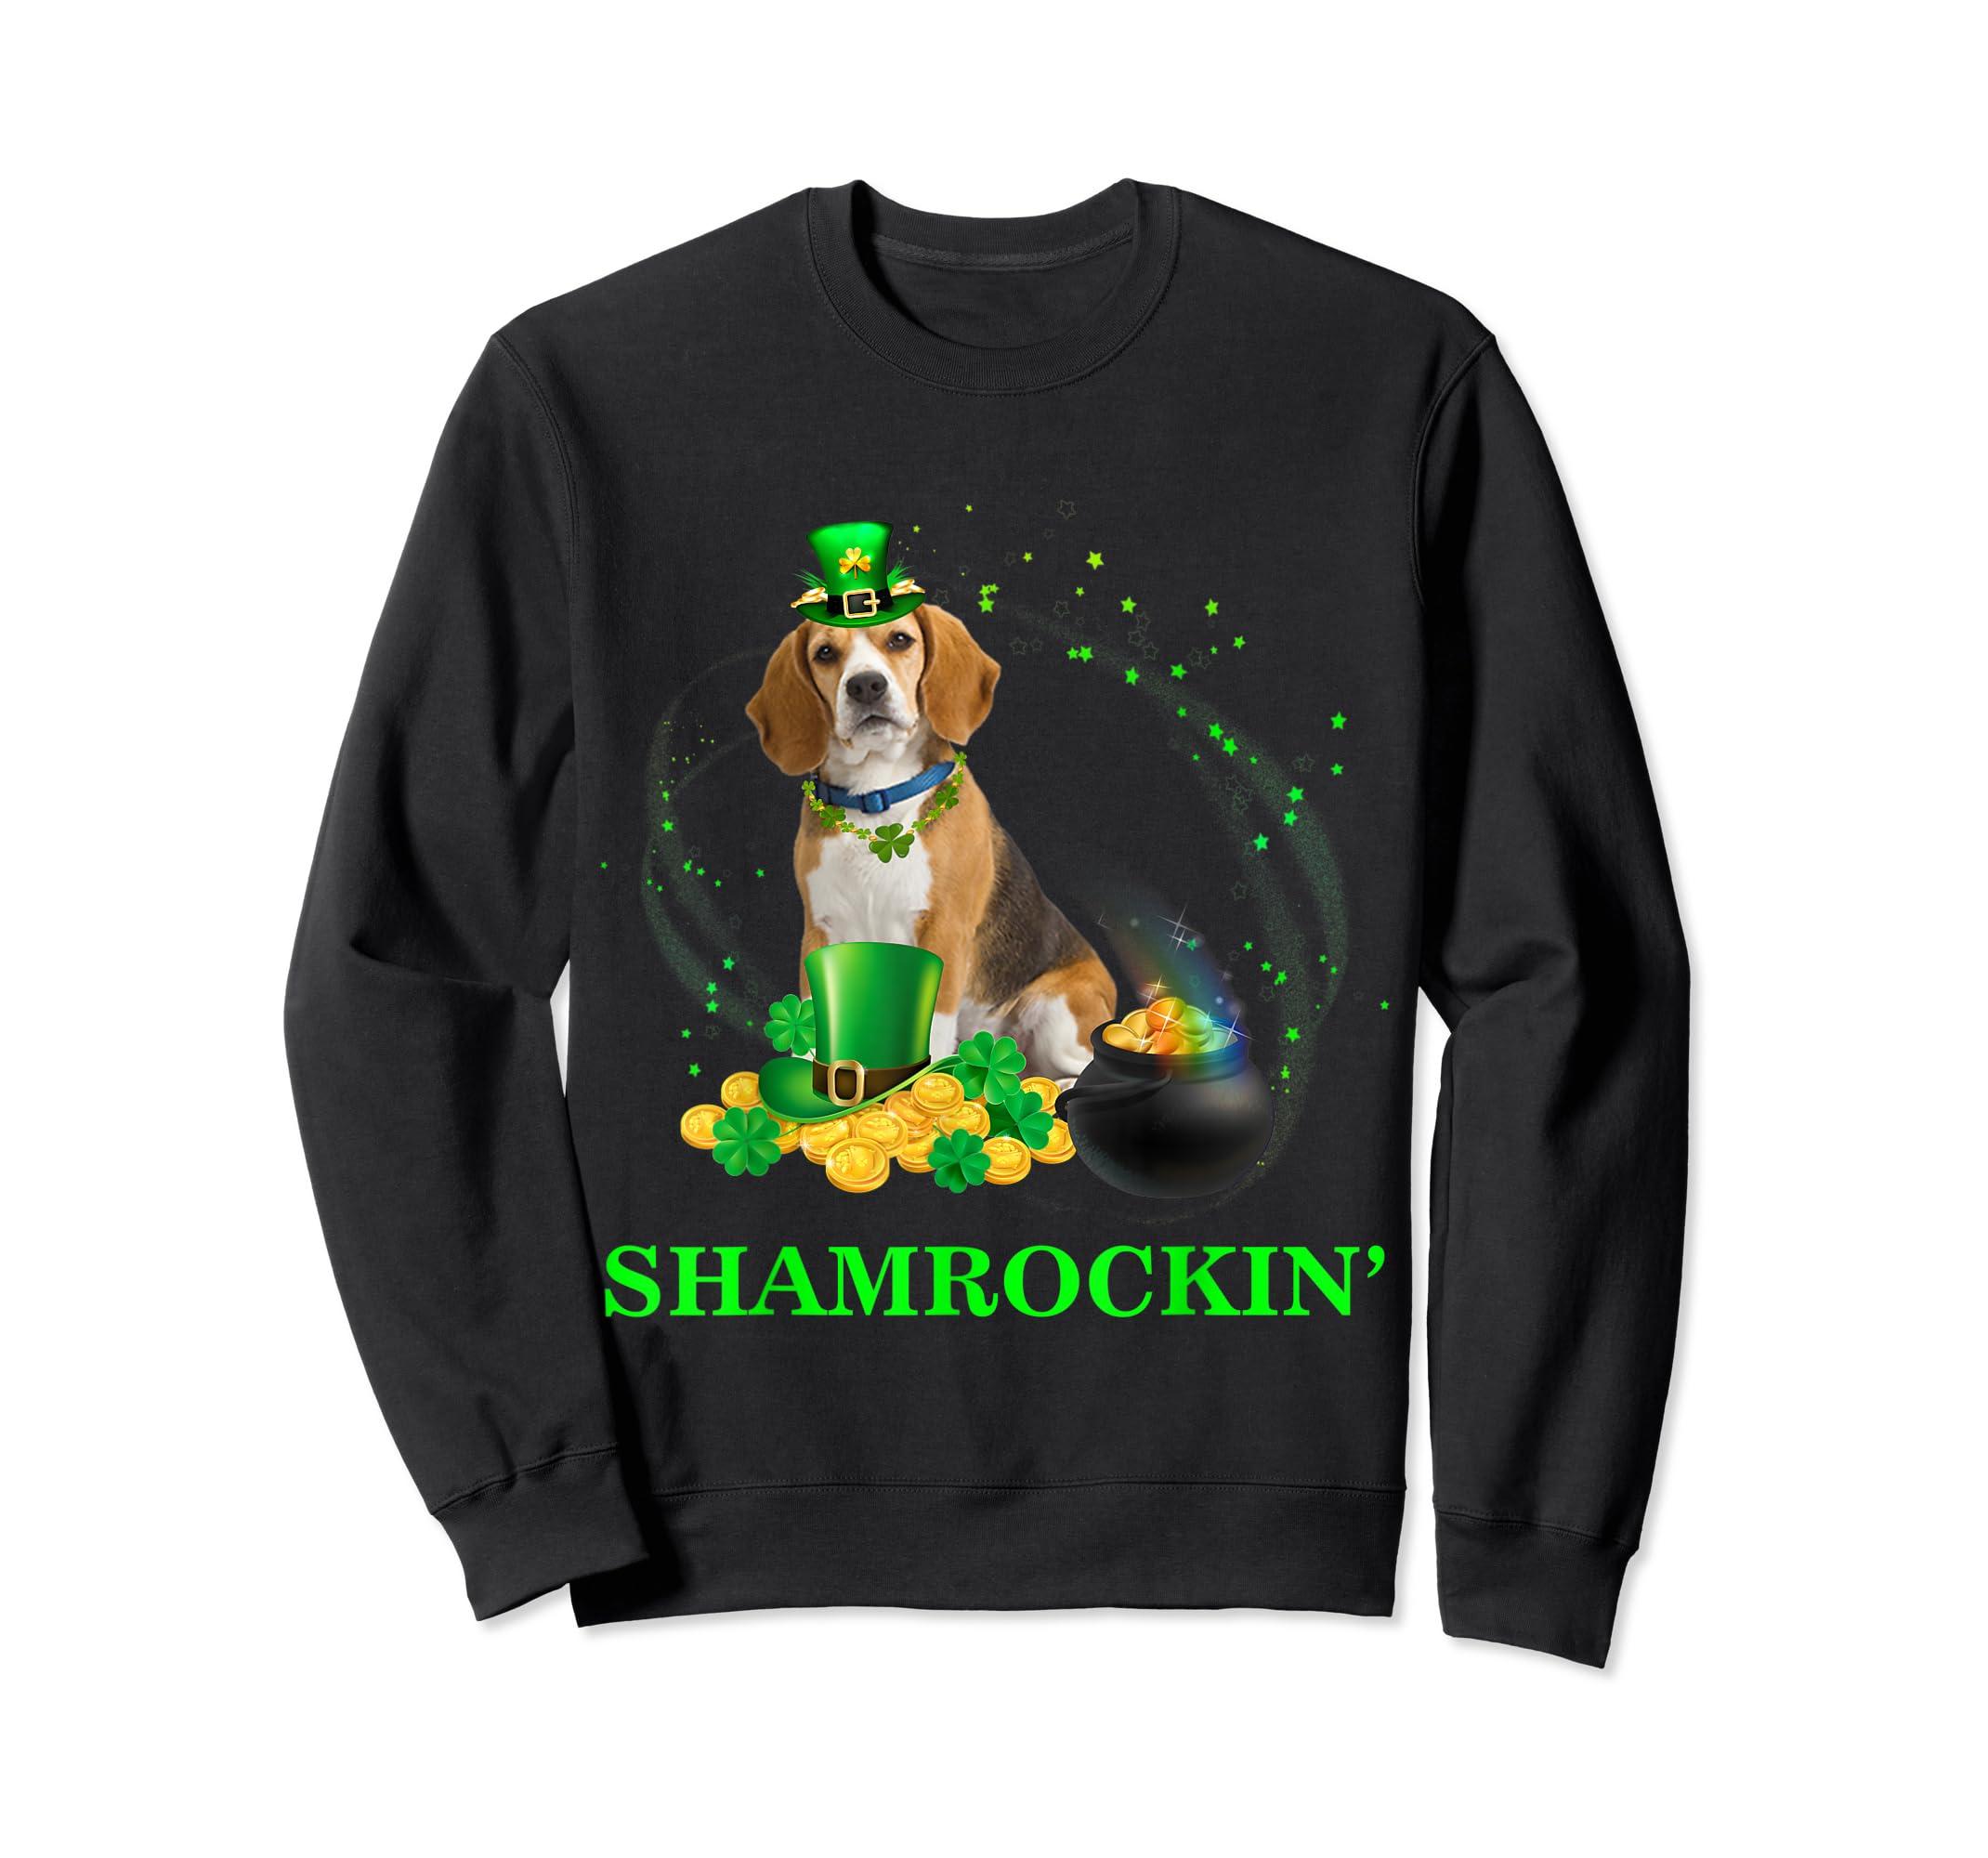 Shamrockin' Beagle St Patricks Day Tshirt Dog Gifts-Sweatshirt-Black